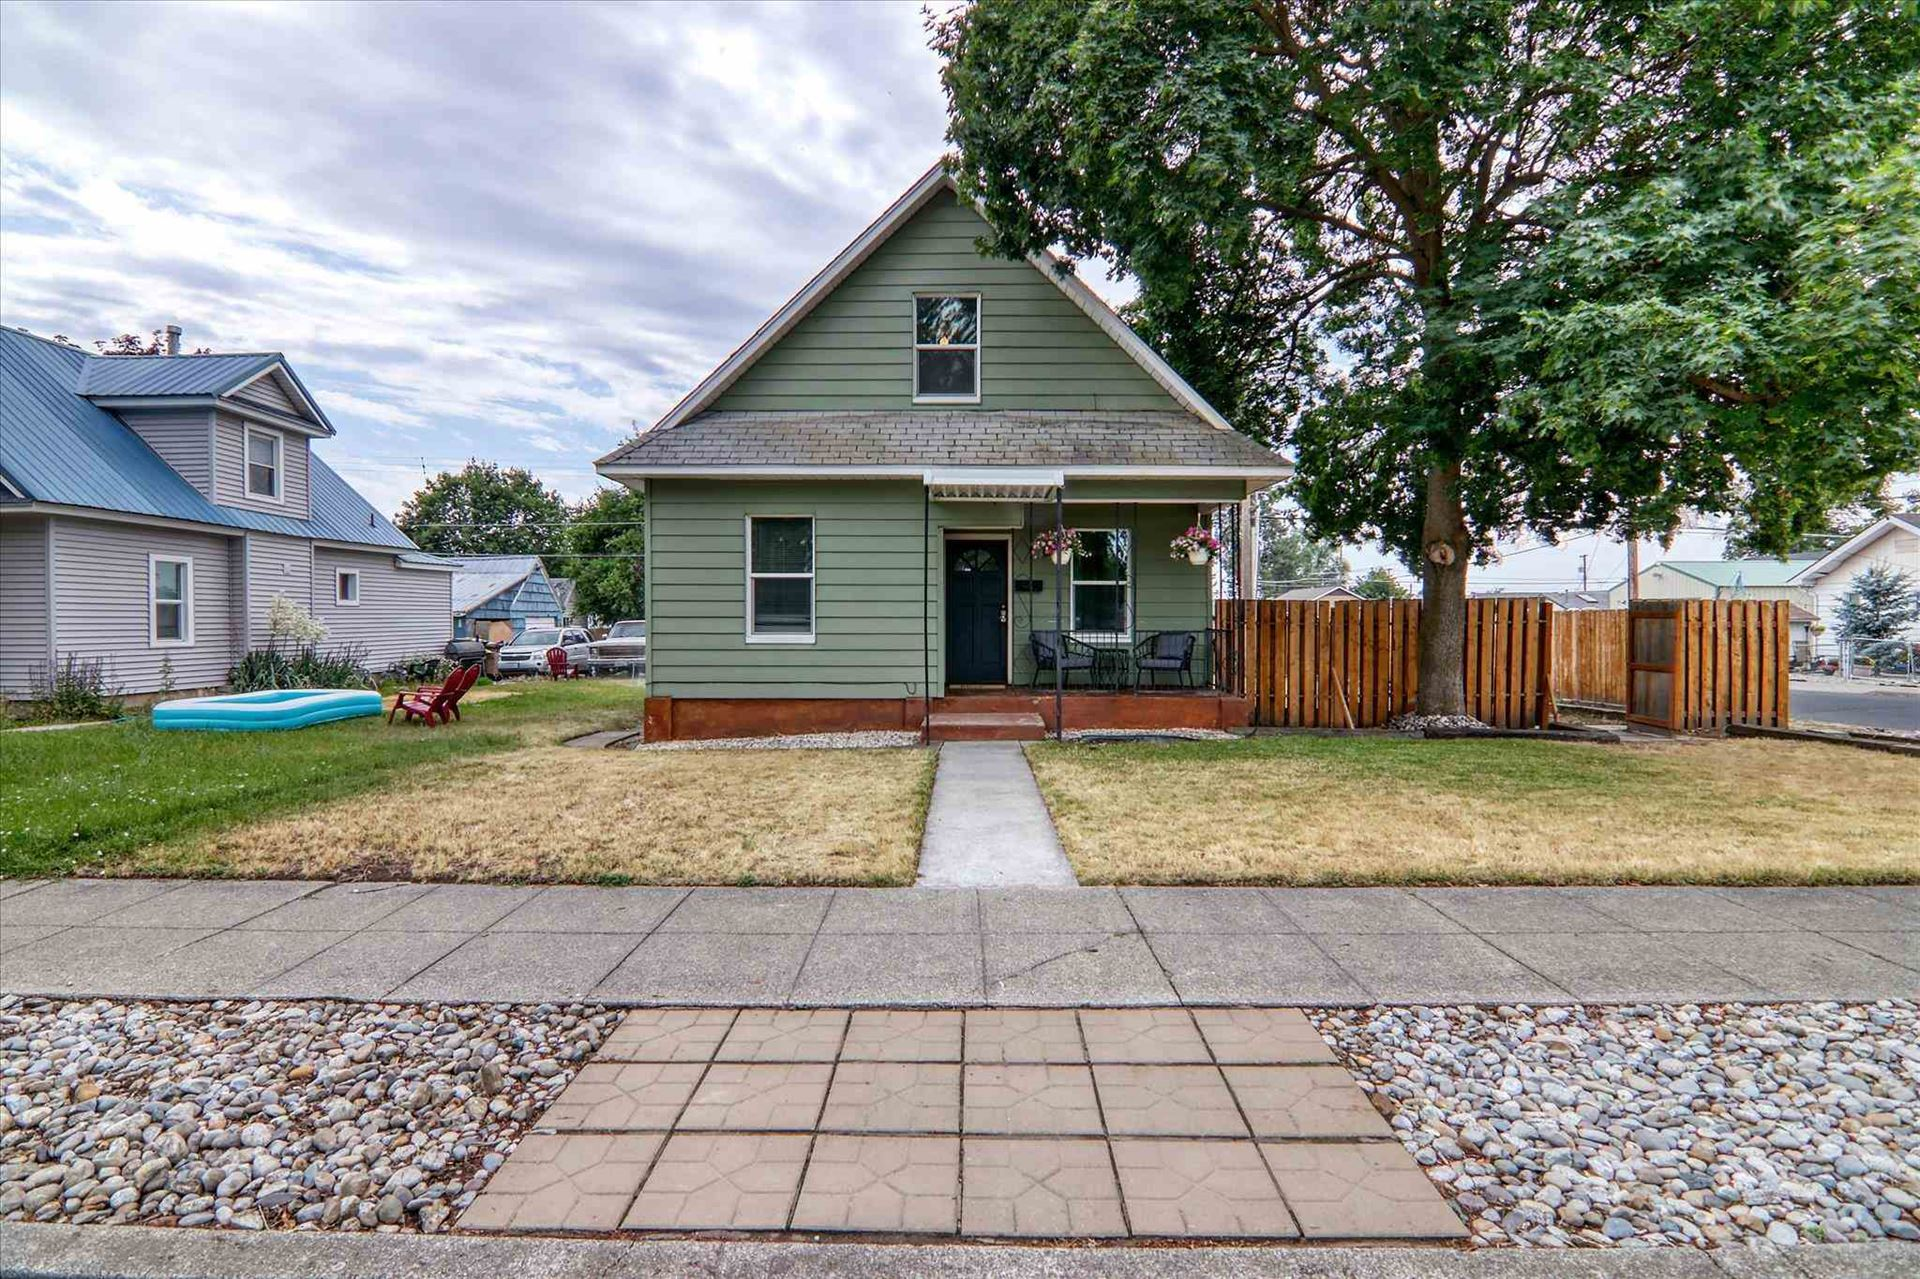 604 E Heroy Ave, Spokane, WA 99207 - #: 202118536